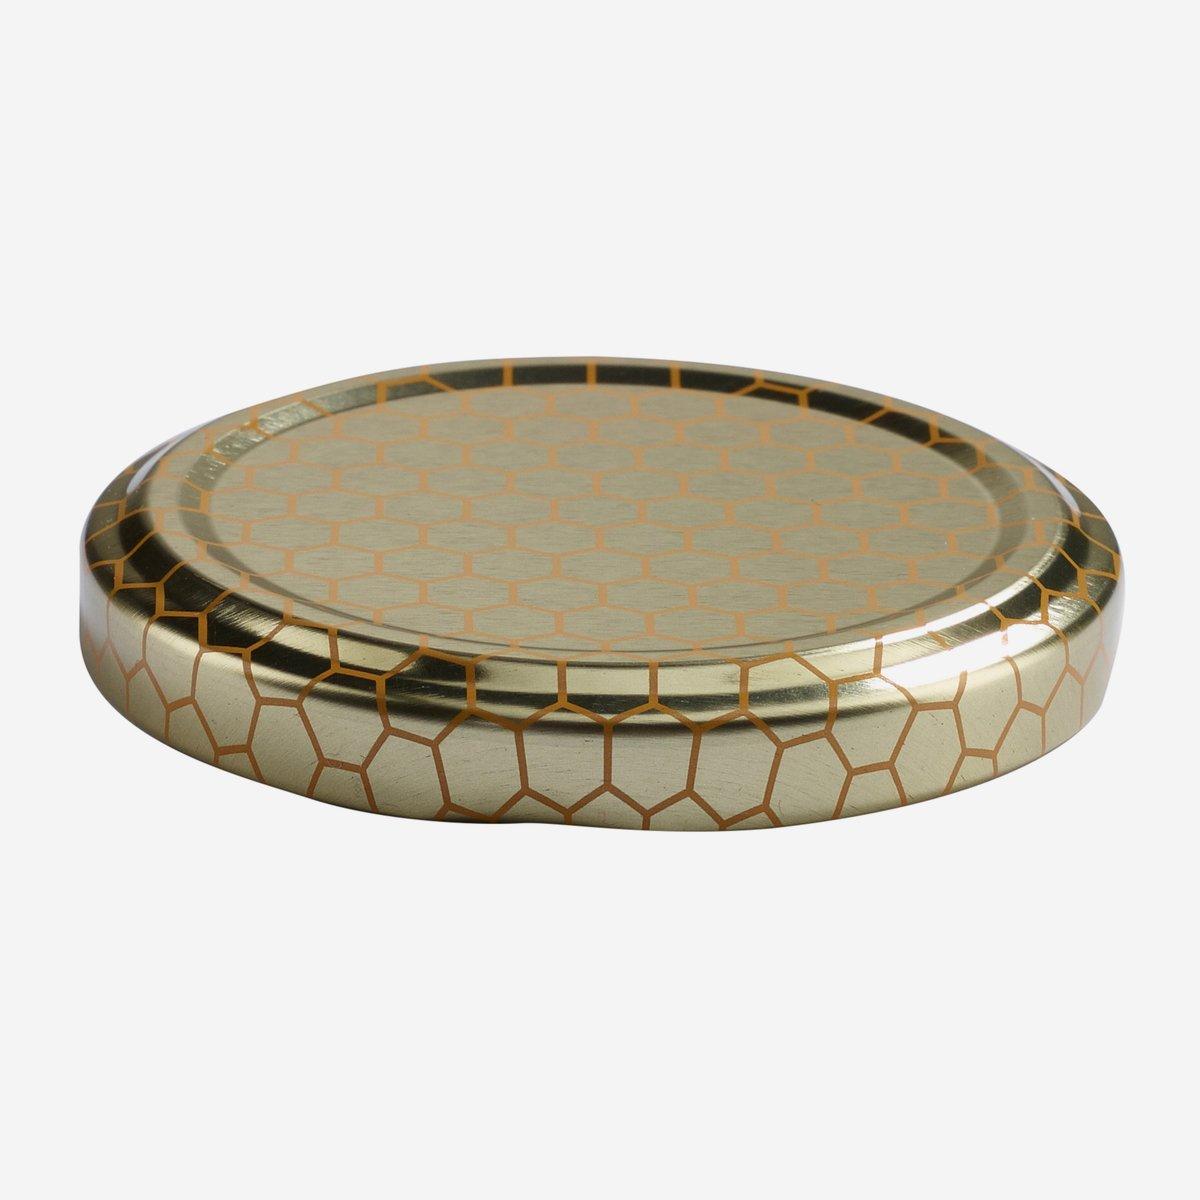 twist off deckel 63mm gold mit wabendekor karton online bestellen. Black Bedroom Furniture Sets. Home Design Ideas